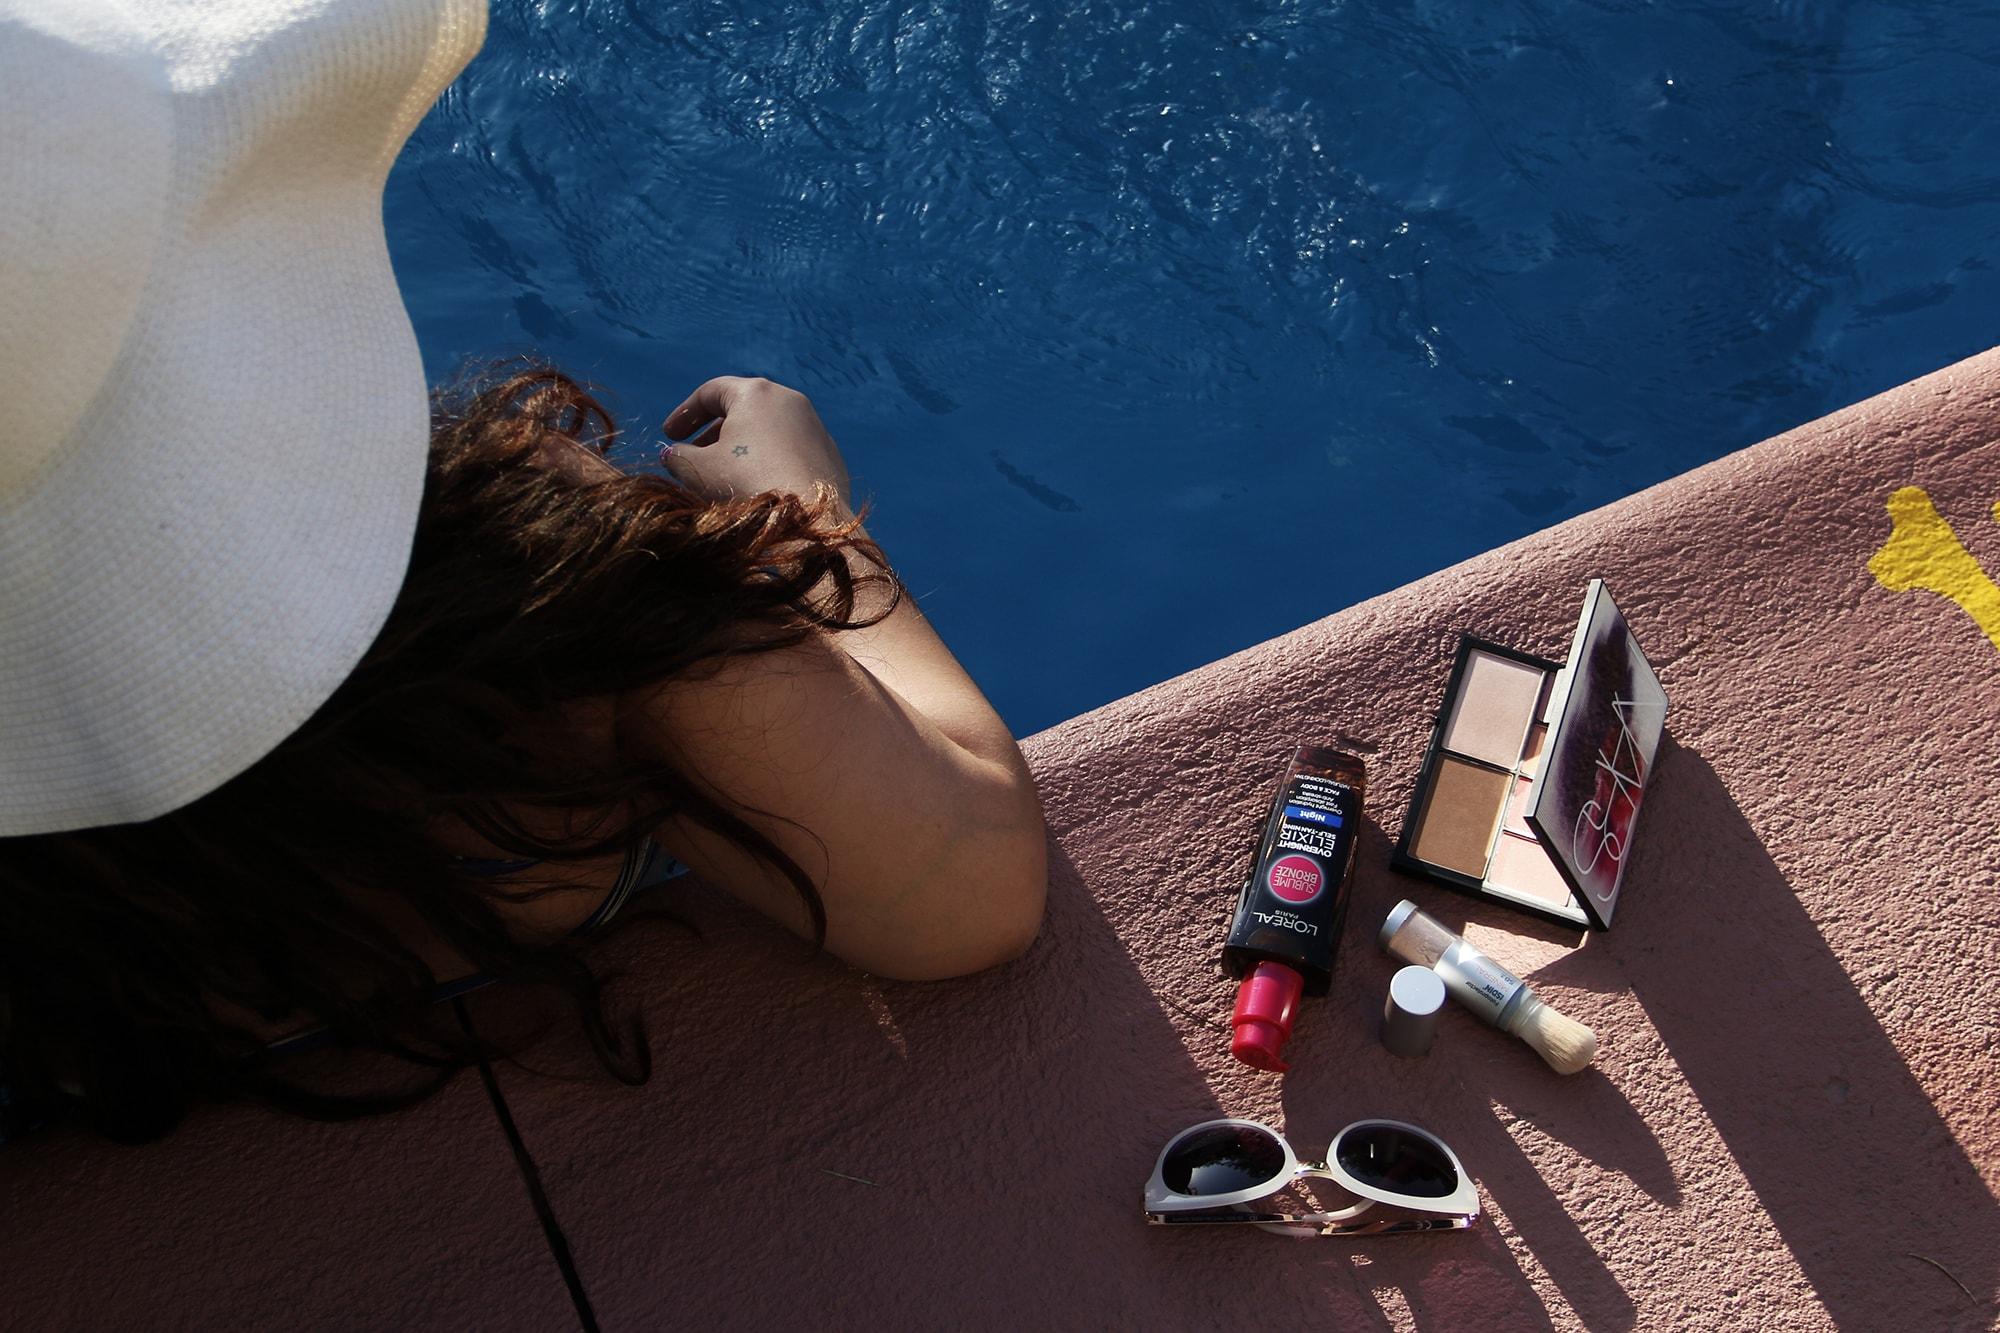 Summer skin care SPF powder sunscreen ISDIN self tanning makeup bronzer palette NARS